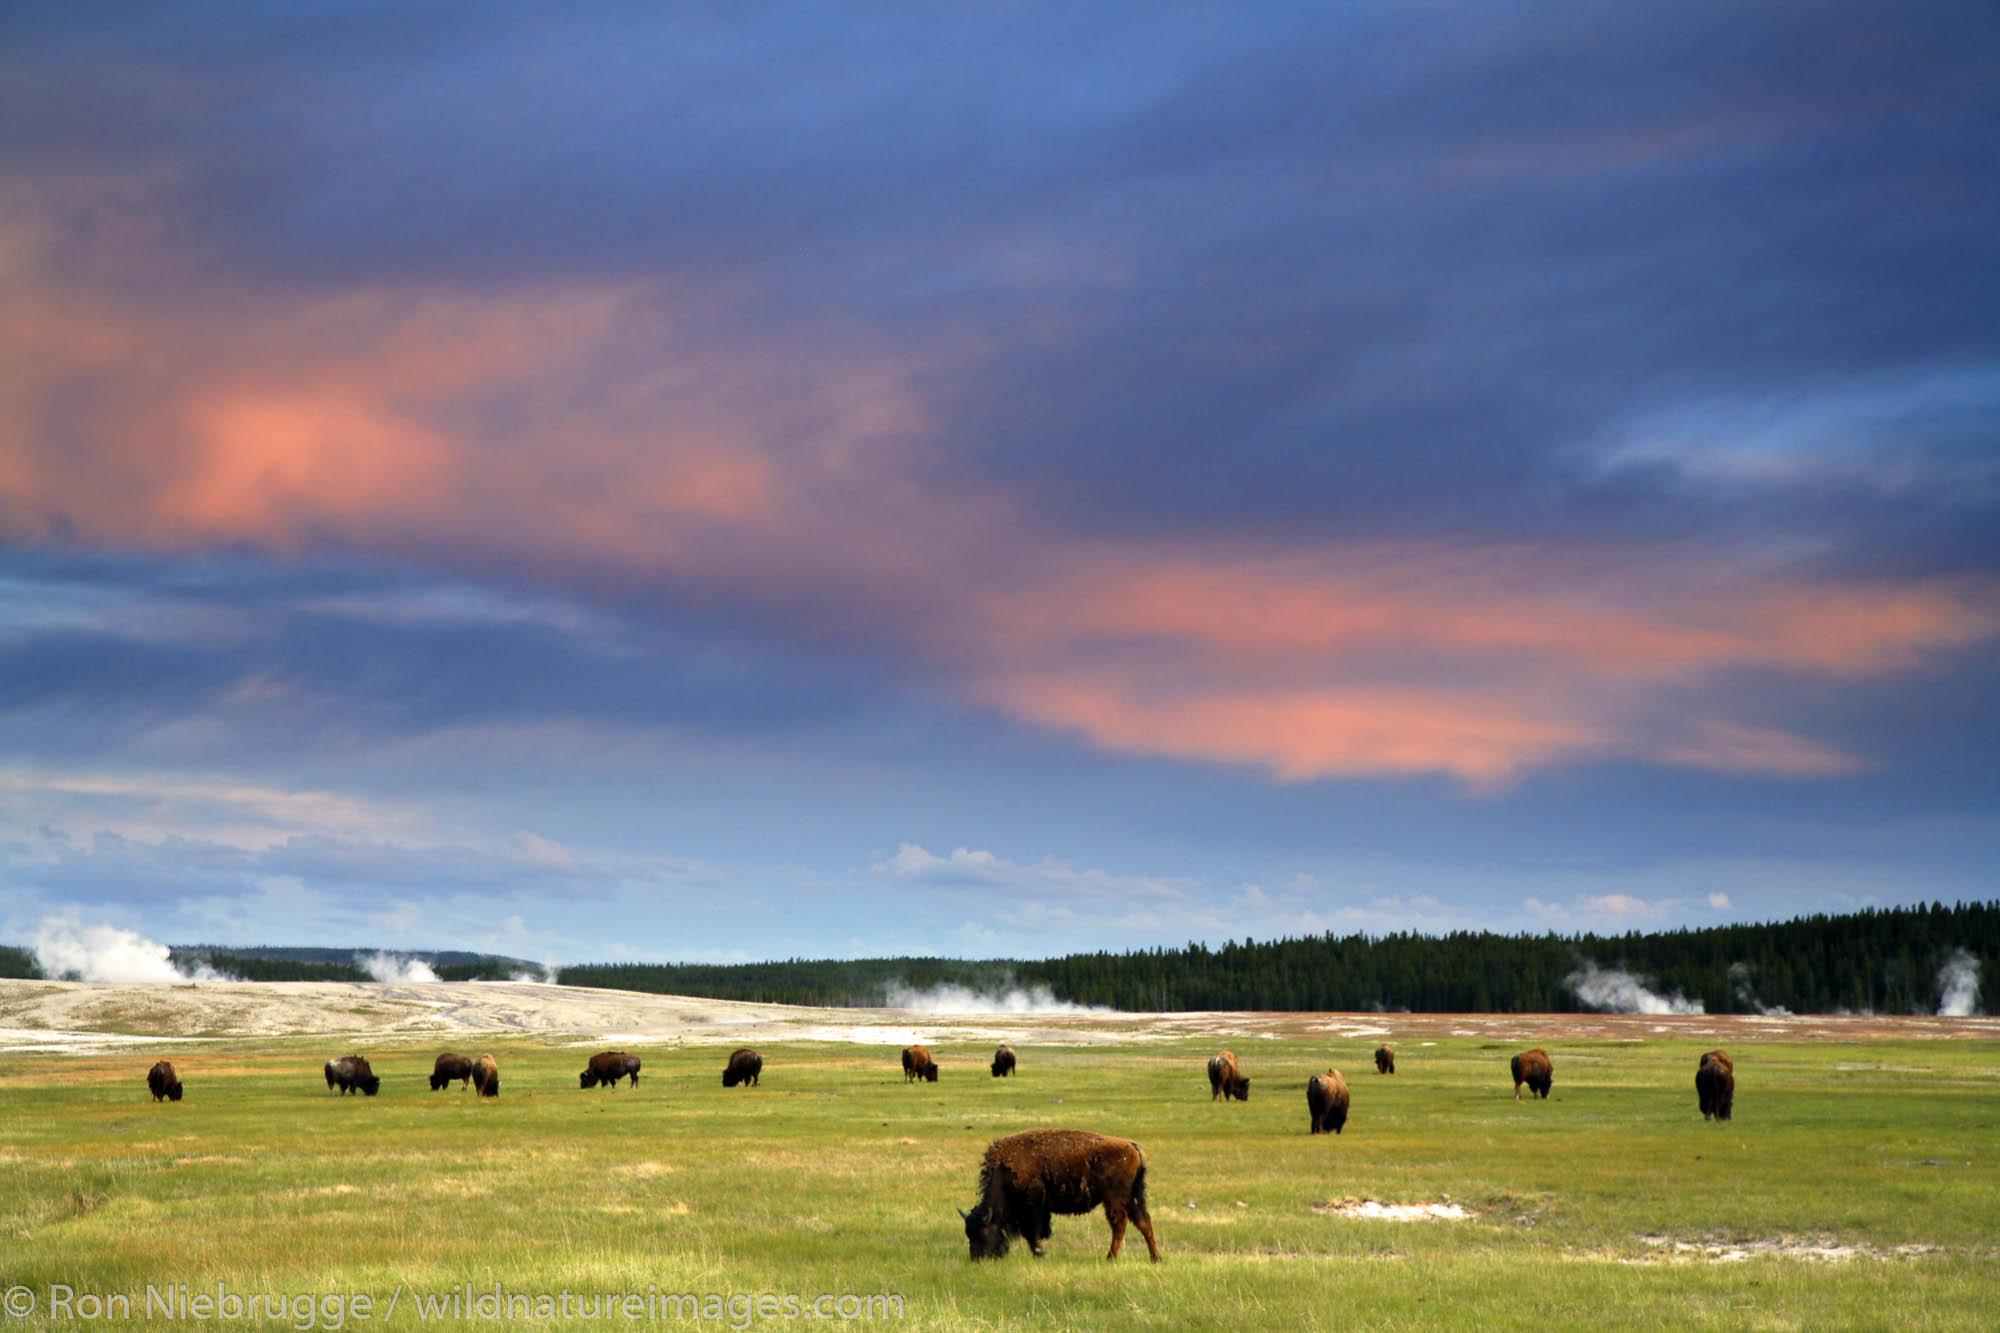 Buffalo at sunset, Midway Geyser Basin, Yellowstone National Park, Wyoming.